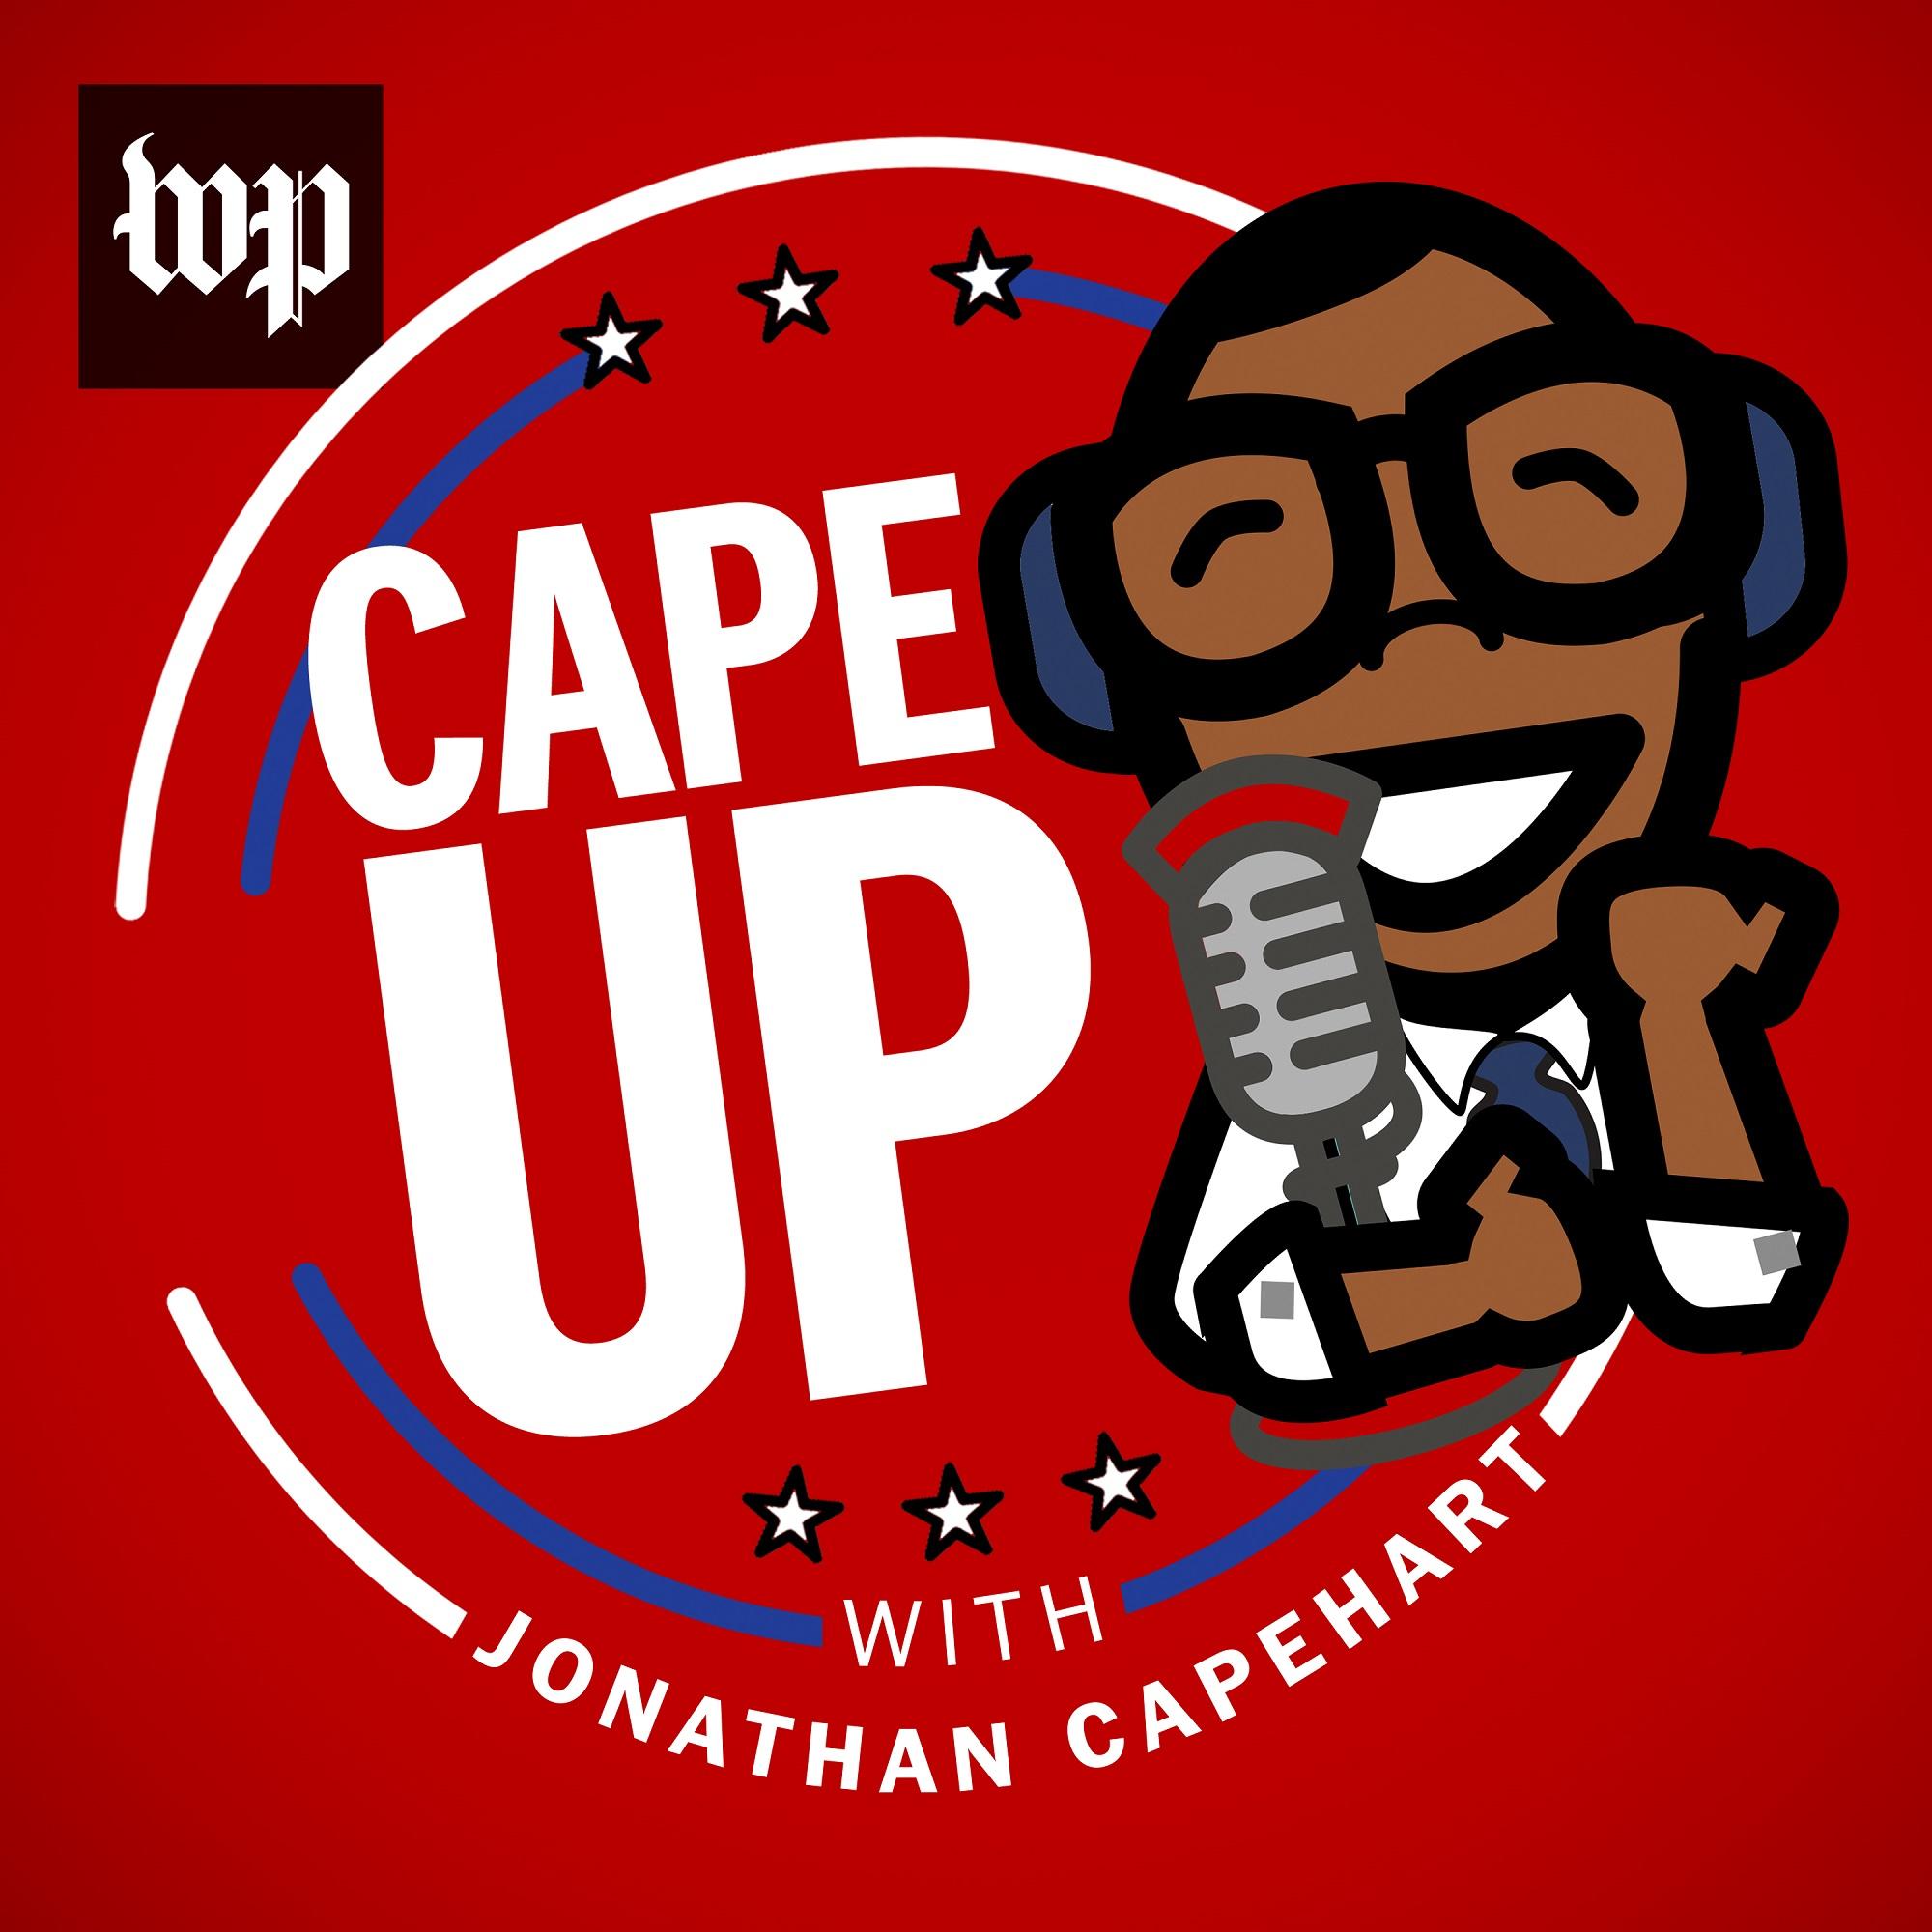 Phanom clipart cape Via On Capehart Radio Jonathan